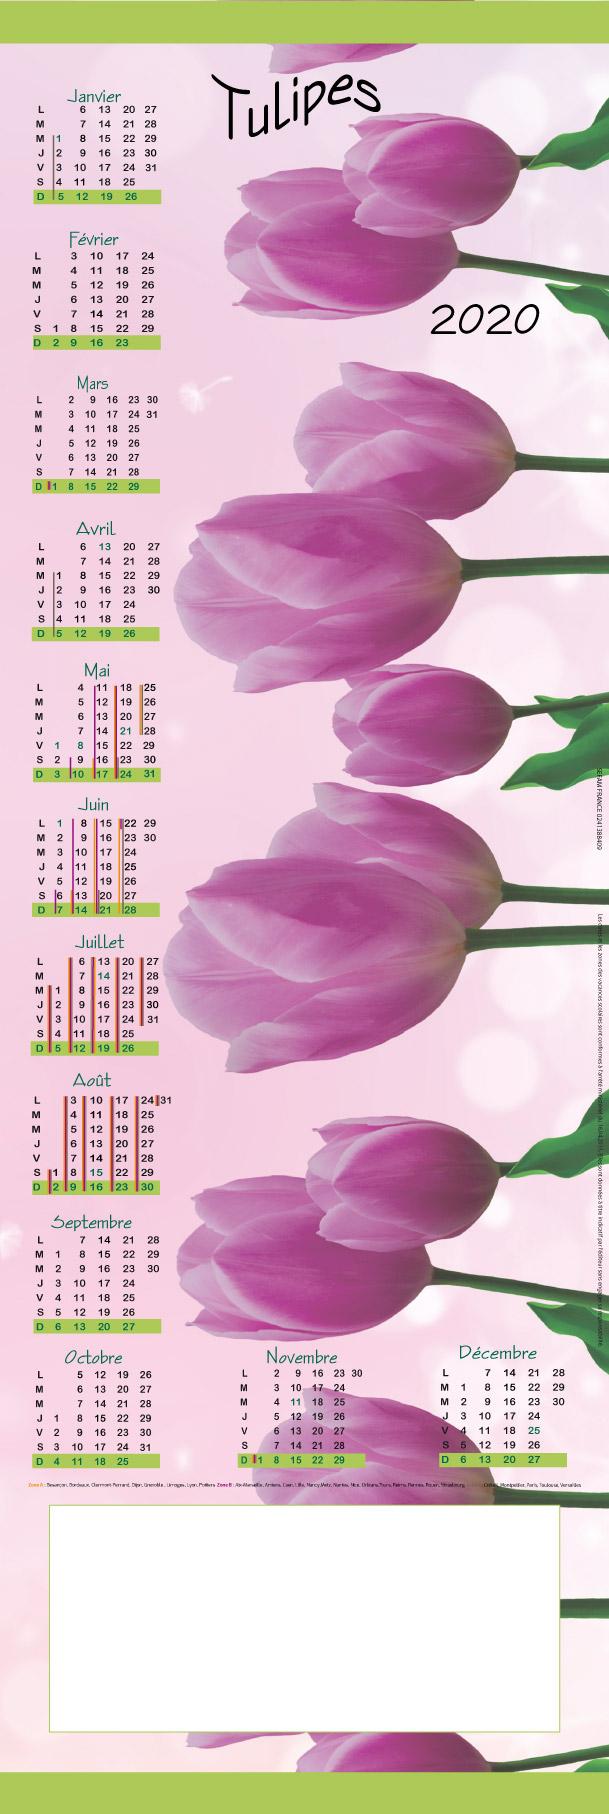 Kakemono-tulipes-sefam